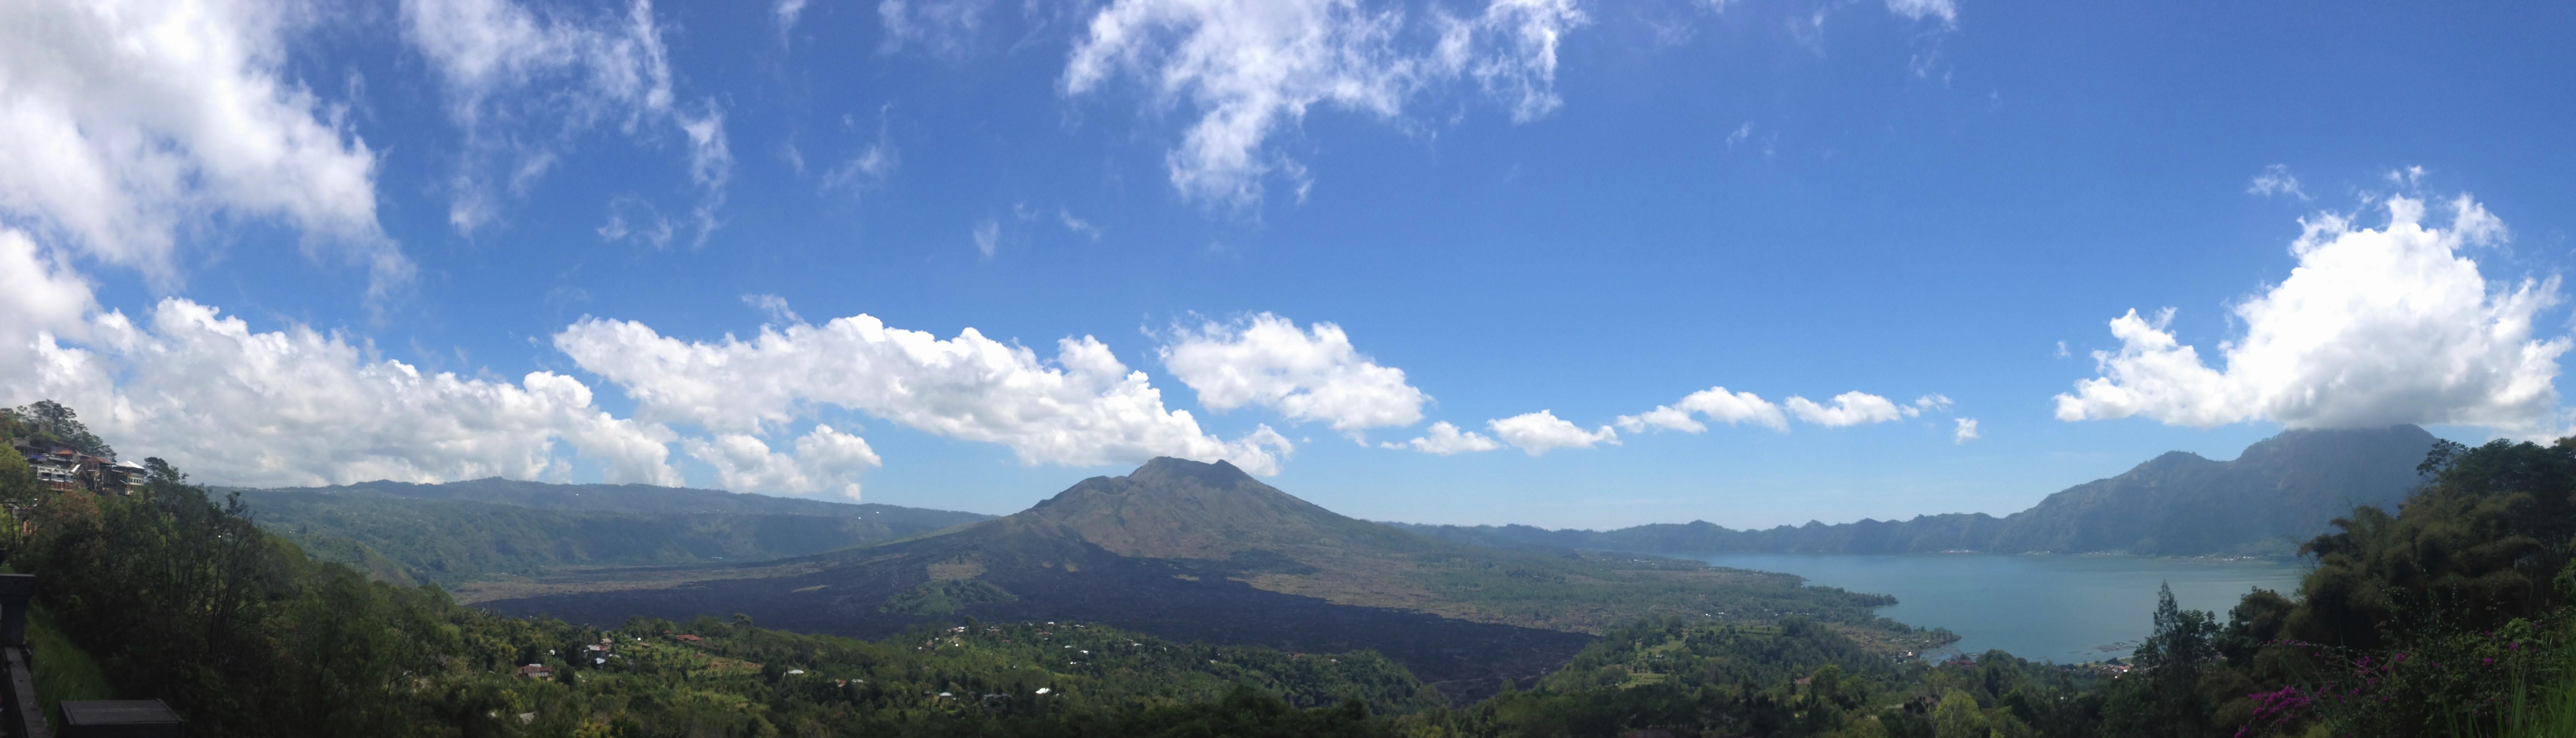 Vulcões na Indonésia